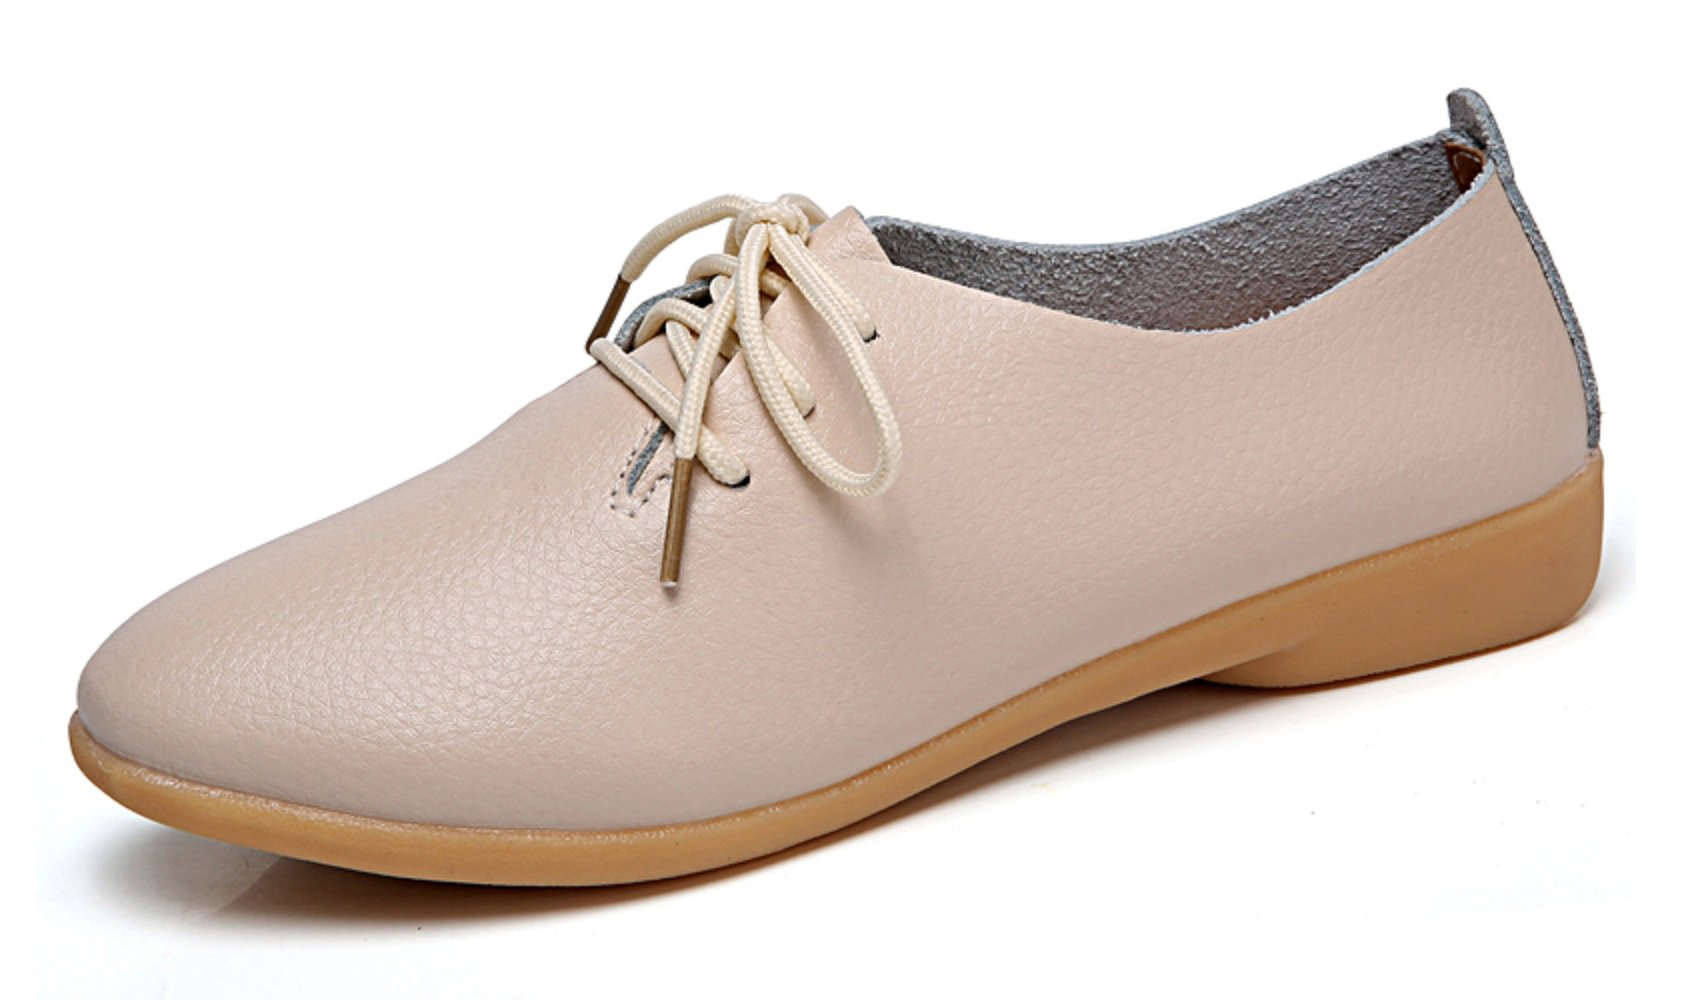 VenusCelia Women's Classic Oxford Flats Shoes(10.5 B(M) US,Beige)